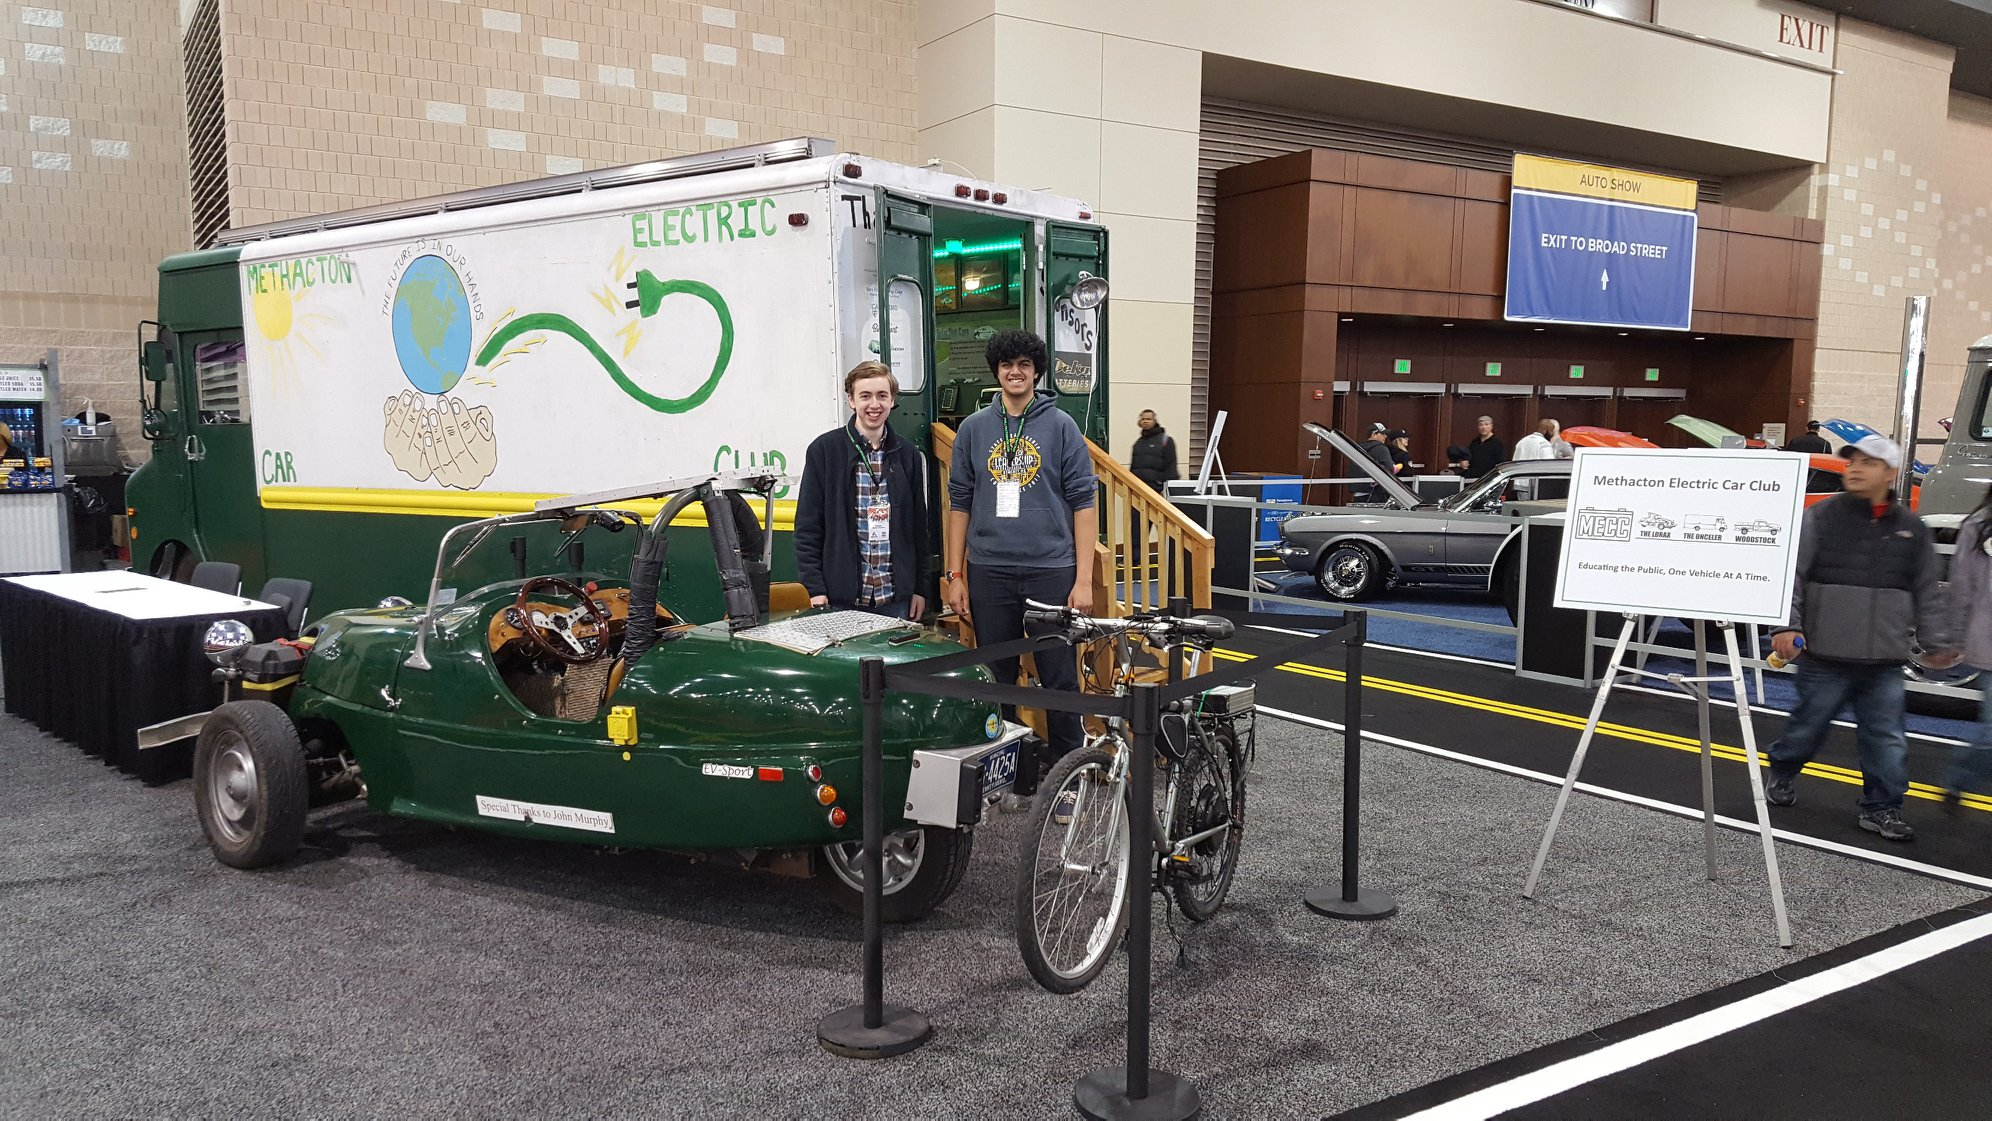 Methacton Electric Car Club Demonstrates at Philadelphia Auto Show